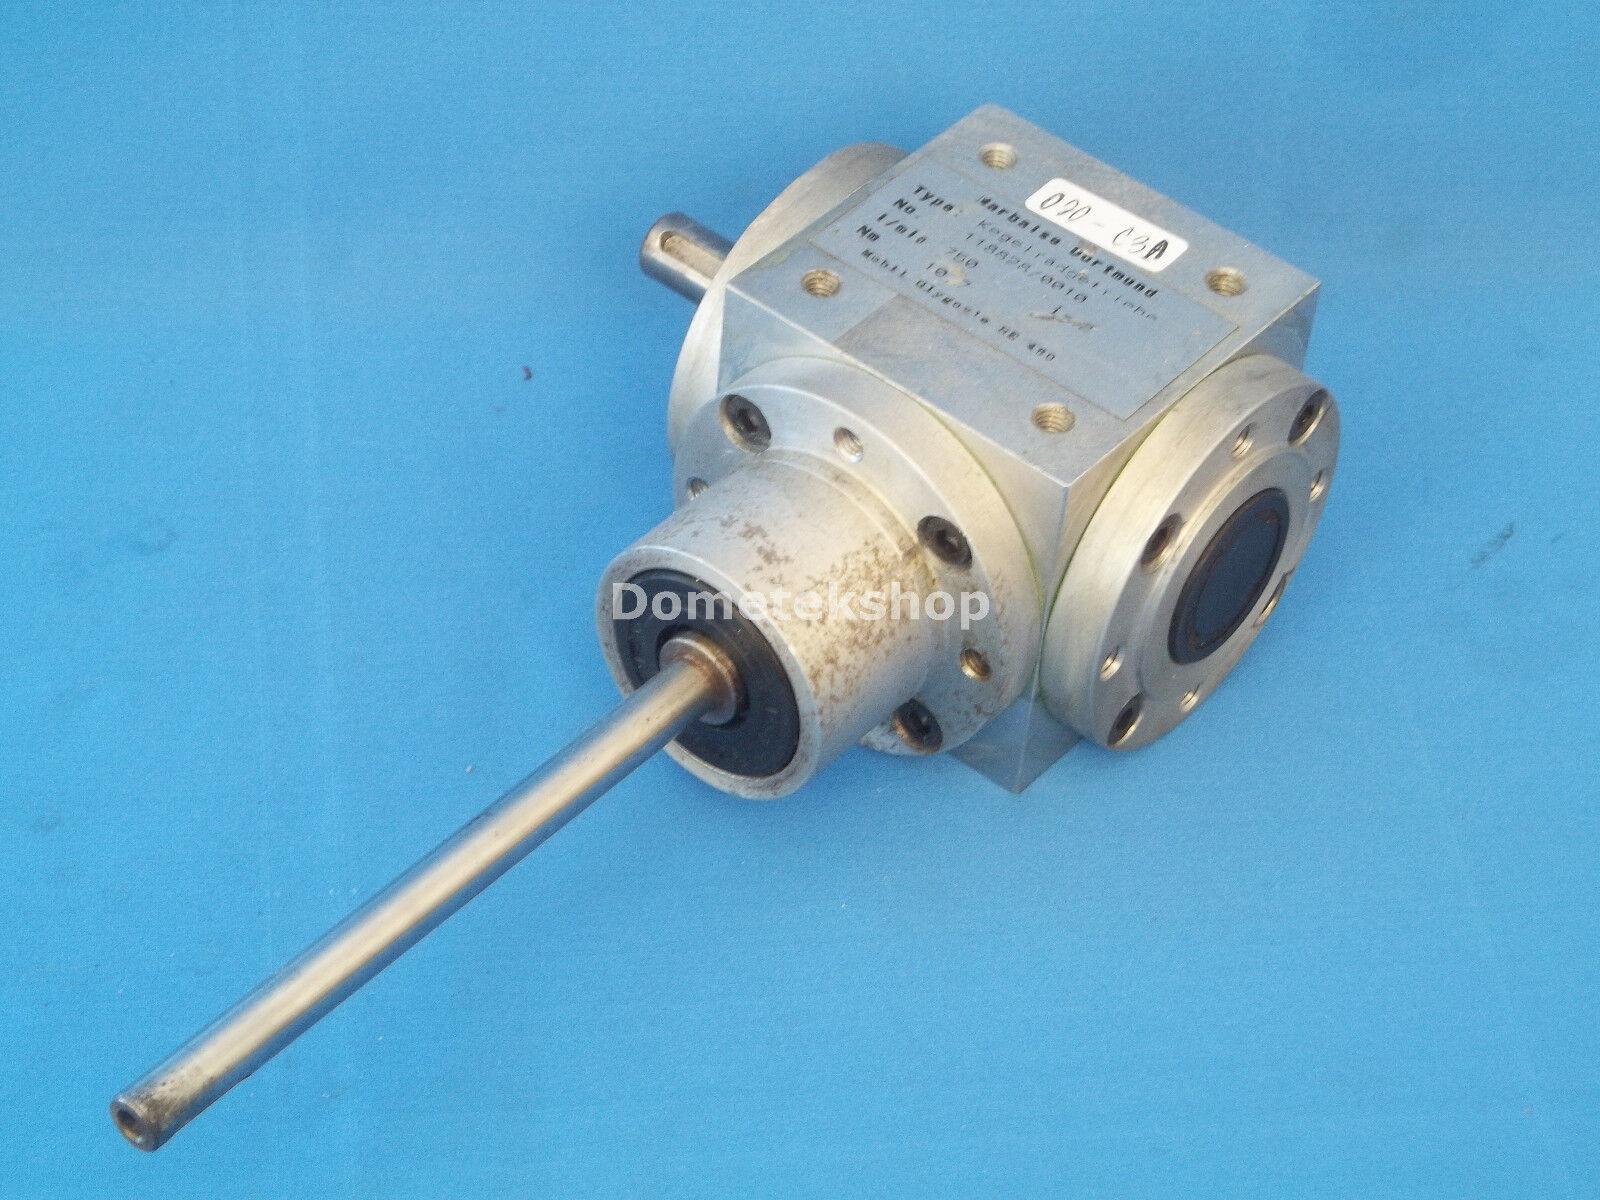 Marbaise Marbaise Marbaise Dortmund kegelradgetriebe 118828/0010 Gear Motor 1b615f